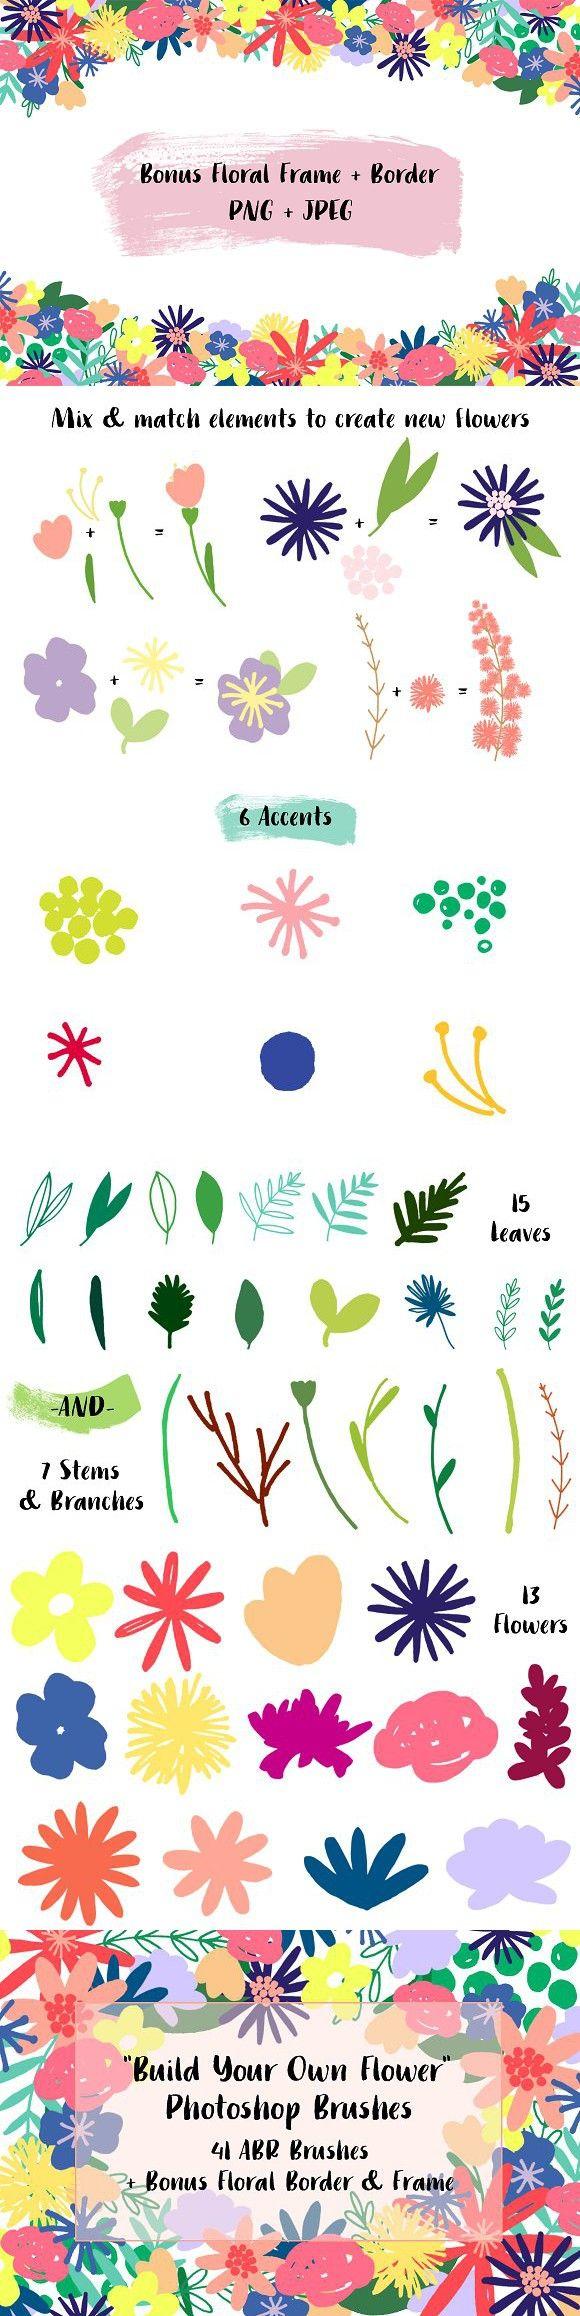 Digital Floral Photoshop Brushes | Pinterest | Photoshop and Adobe